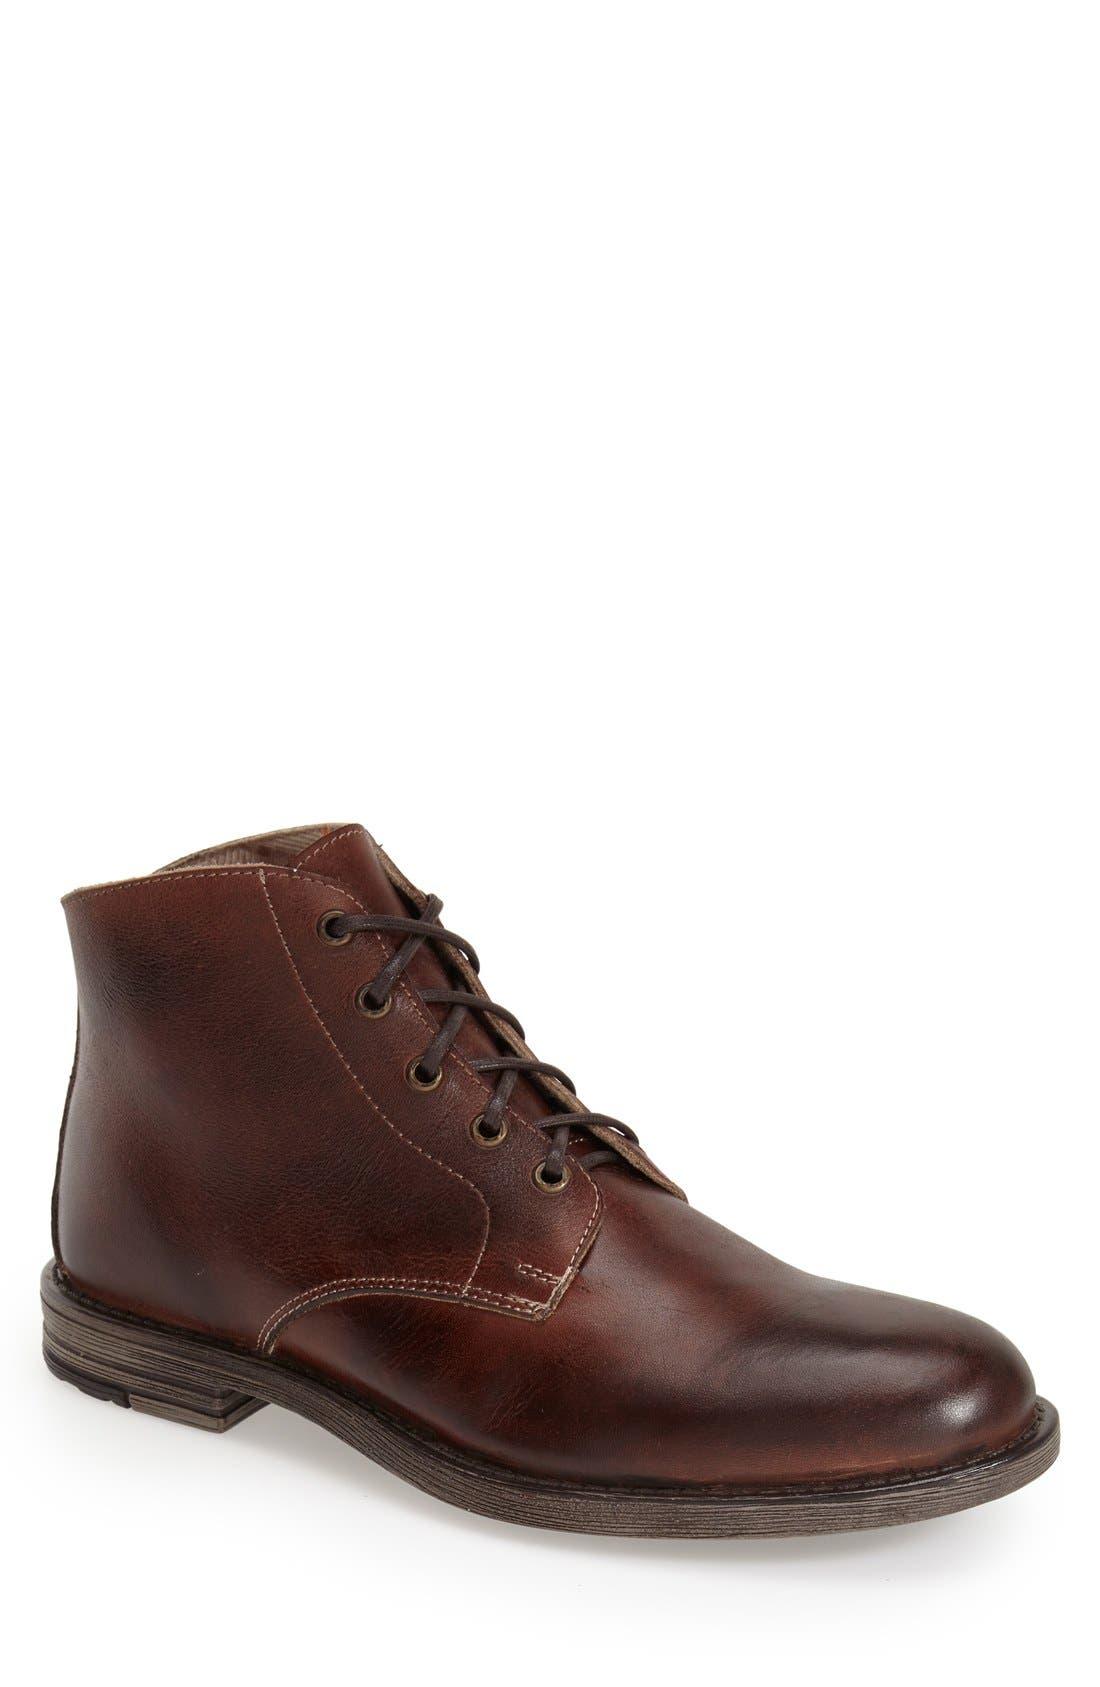 Main Image - Bed Stu 'Hoover' Boot (Men)